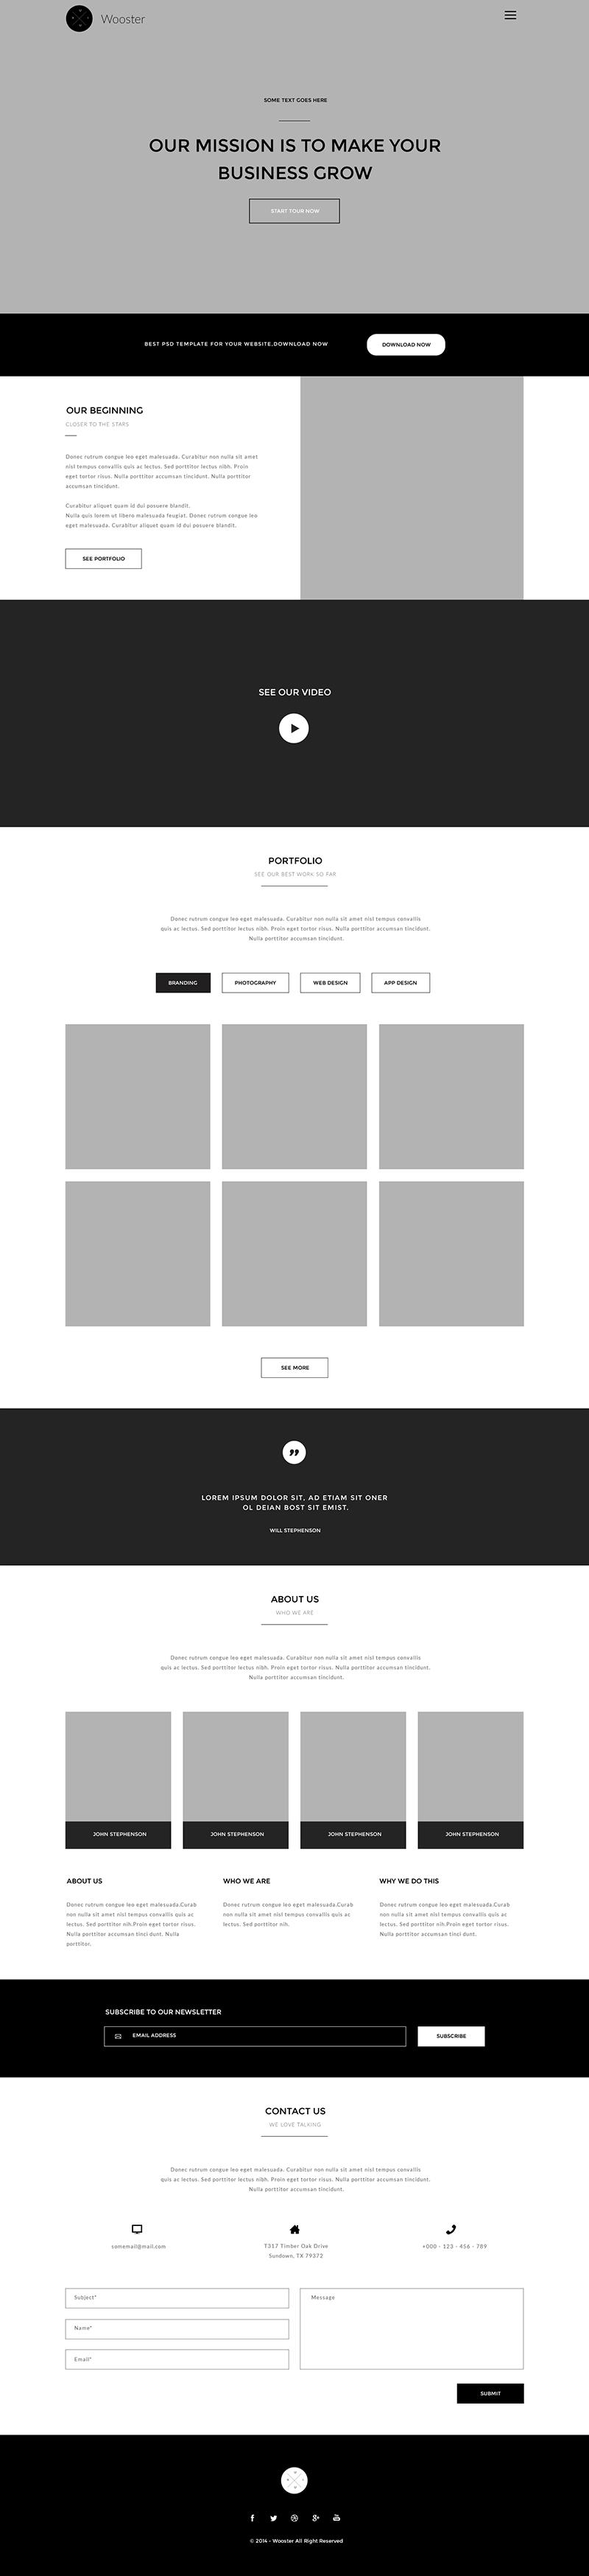 wooster设计网站PSD模板